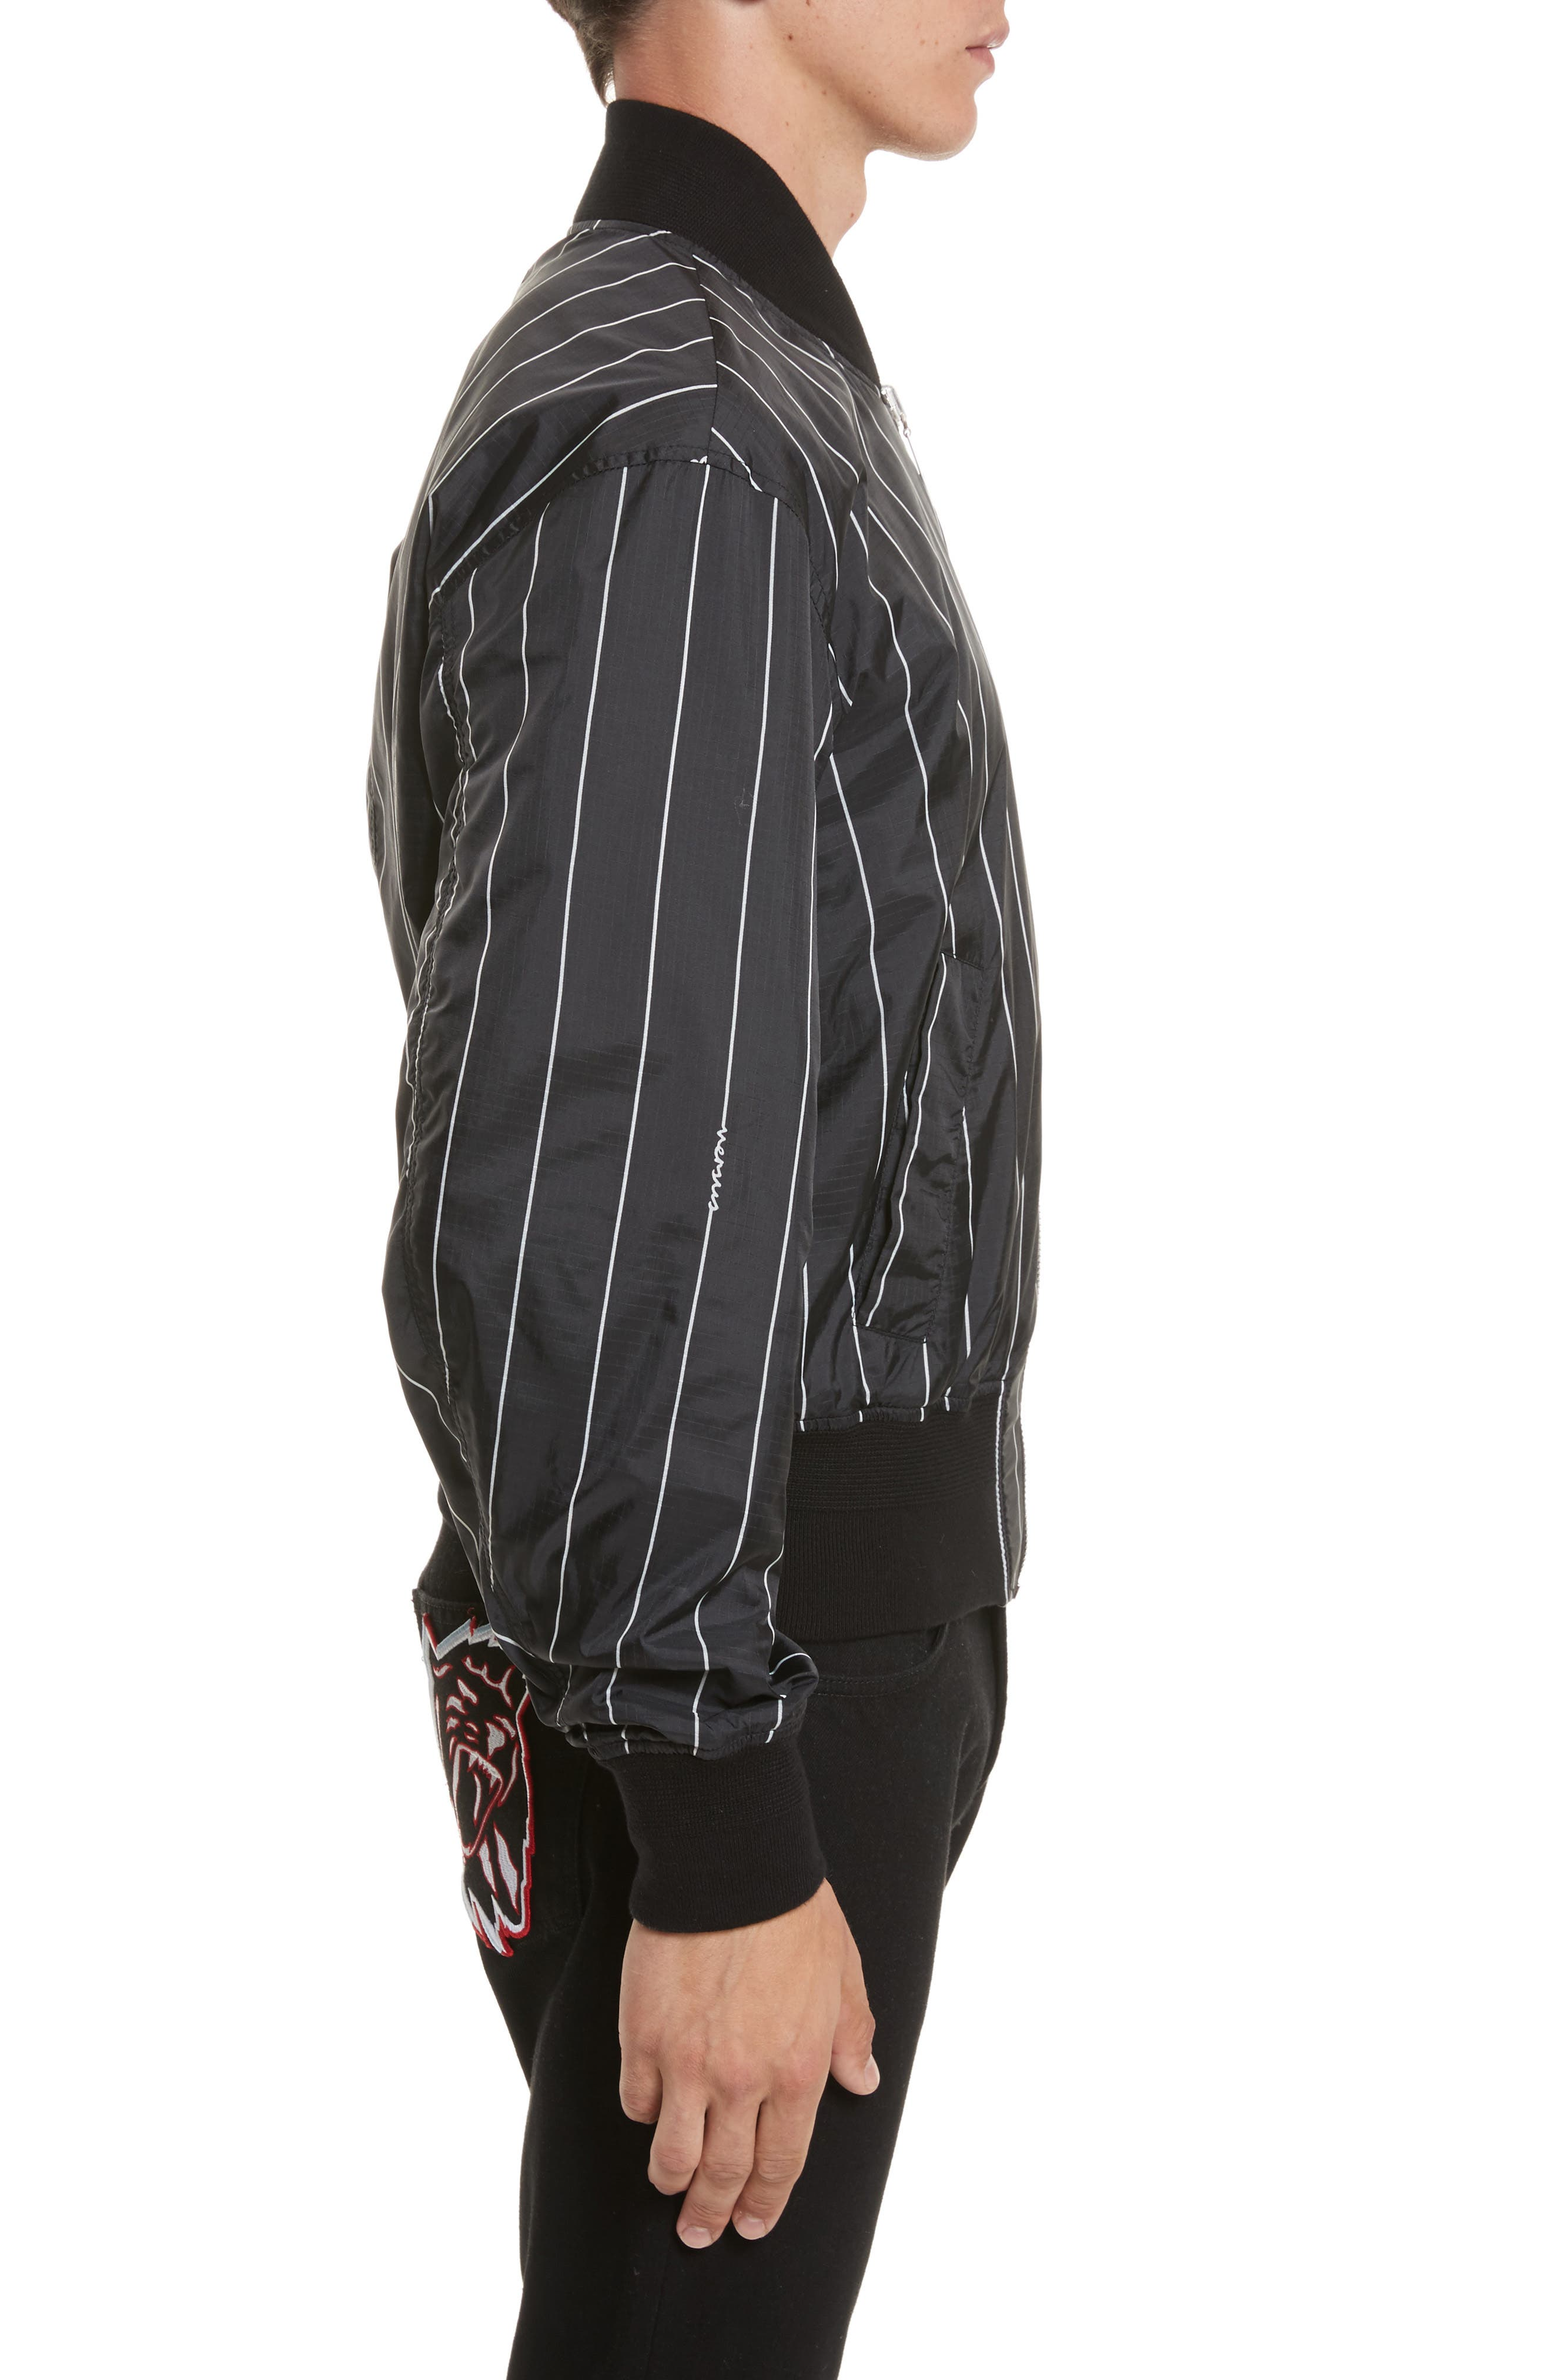 VERSUS by Versace Reversible Pinstripe Bomber Jacket,                             Alternate thumbnail 3, color,                             Black